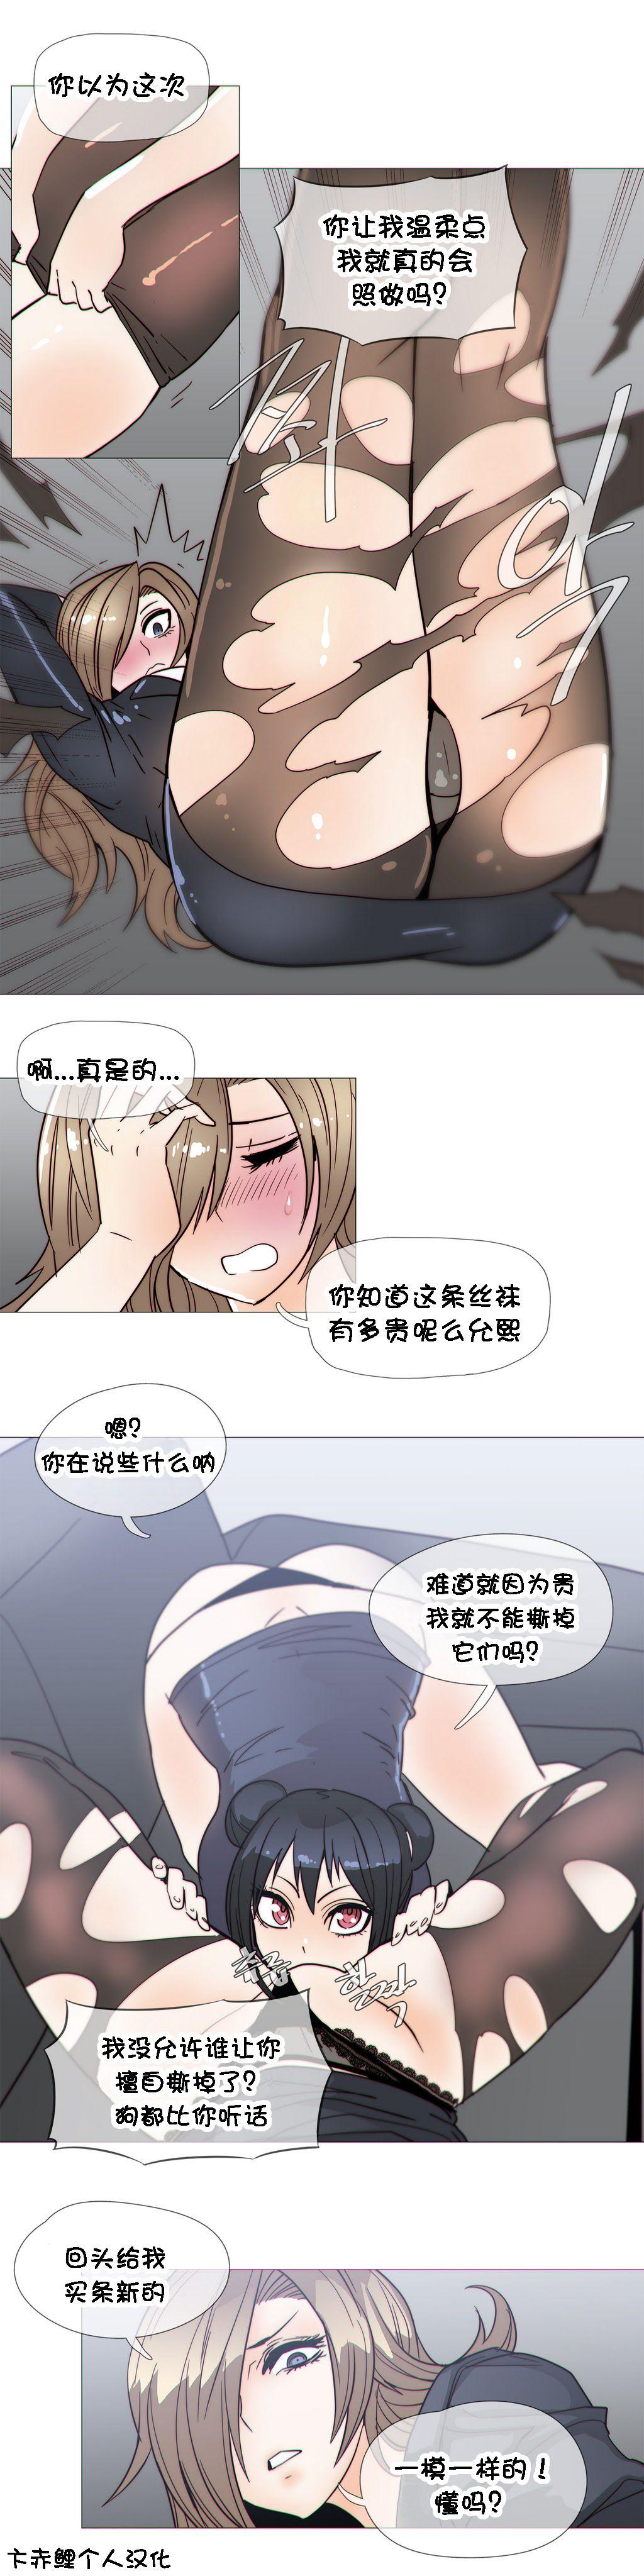 HouseHold Affairs 【卞赤鲤个人汉化】1~33话(持续更新中) 578